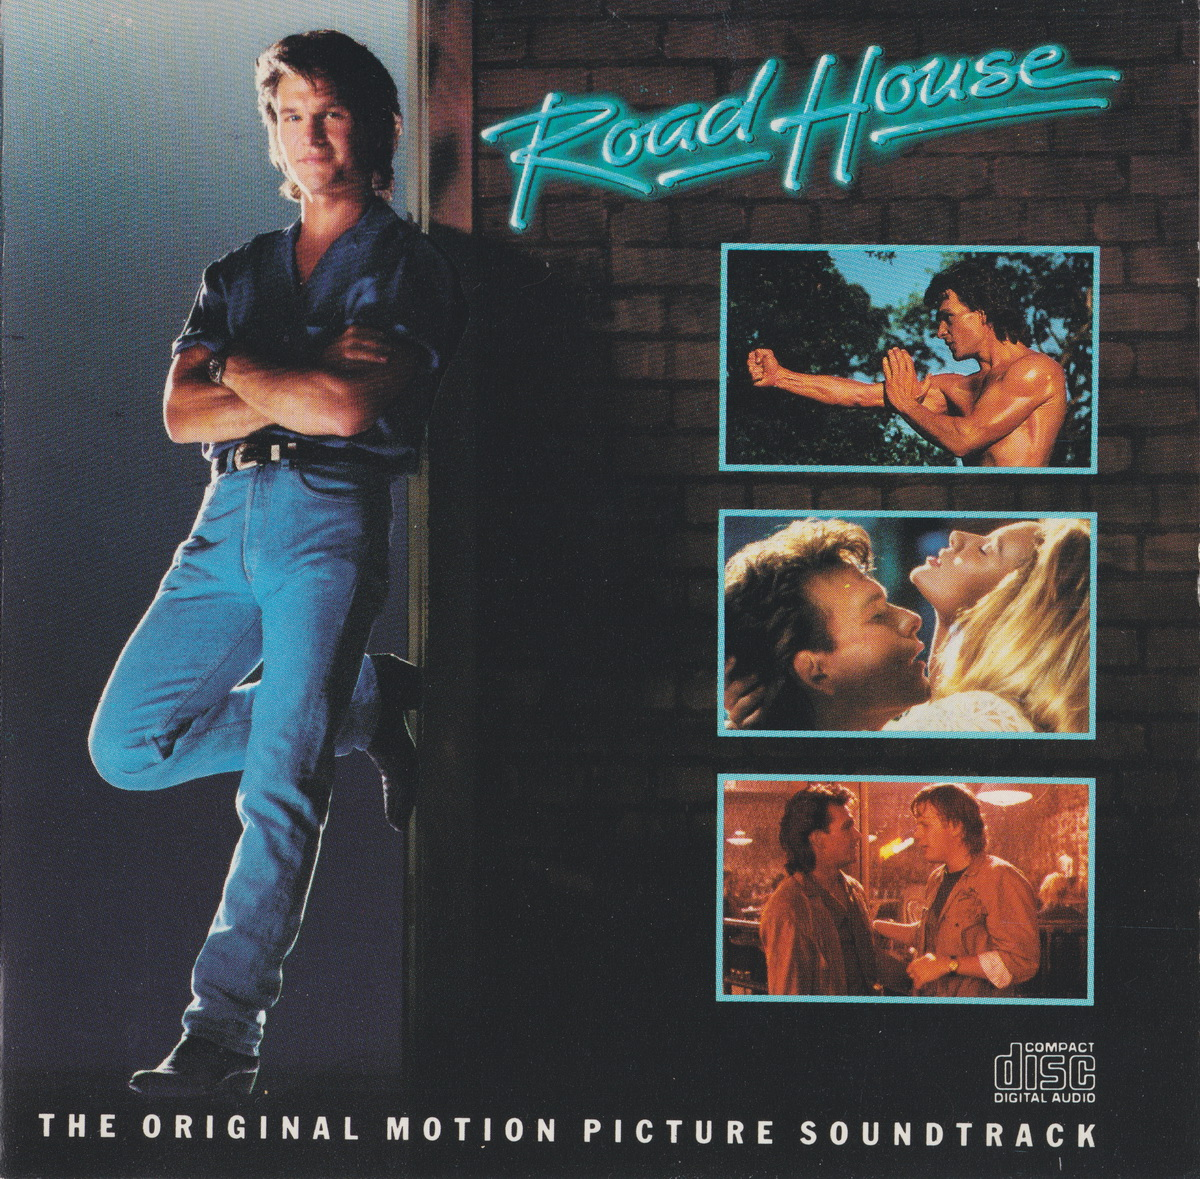 Road House Soundtrack - Jeff Healey